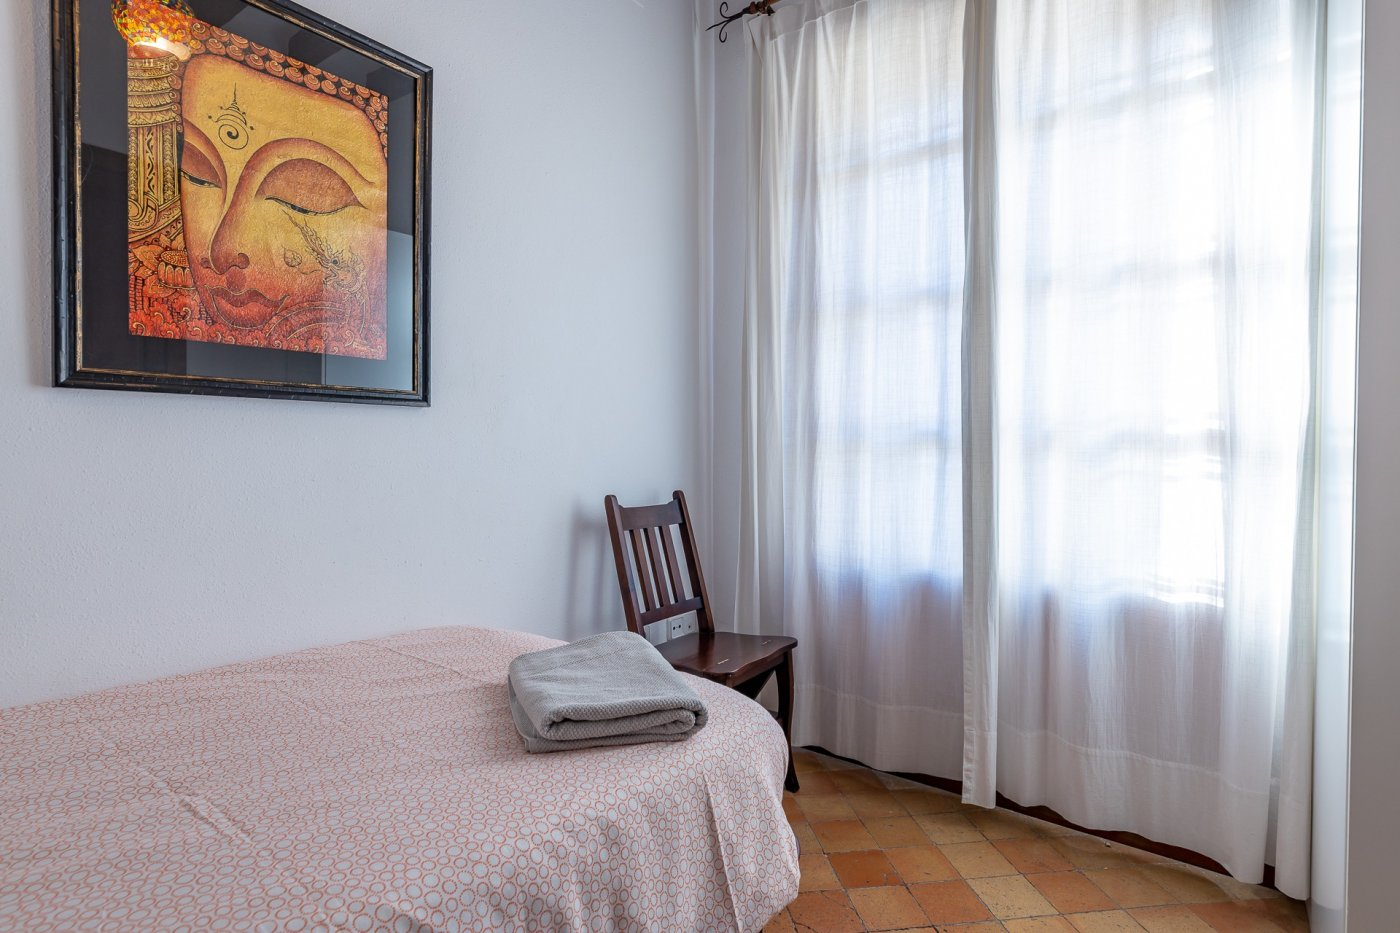 Espectacular apartamento en centro de palma - imagenInmueble19